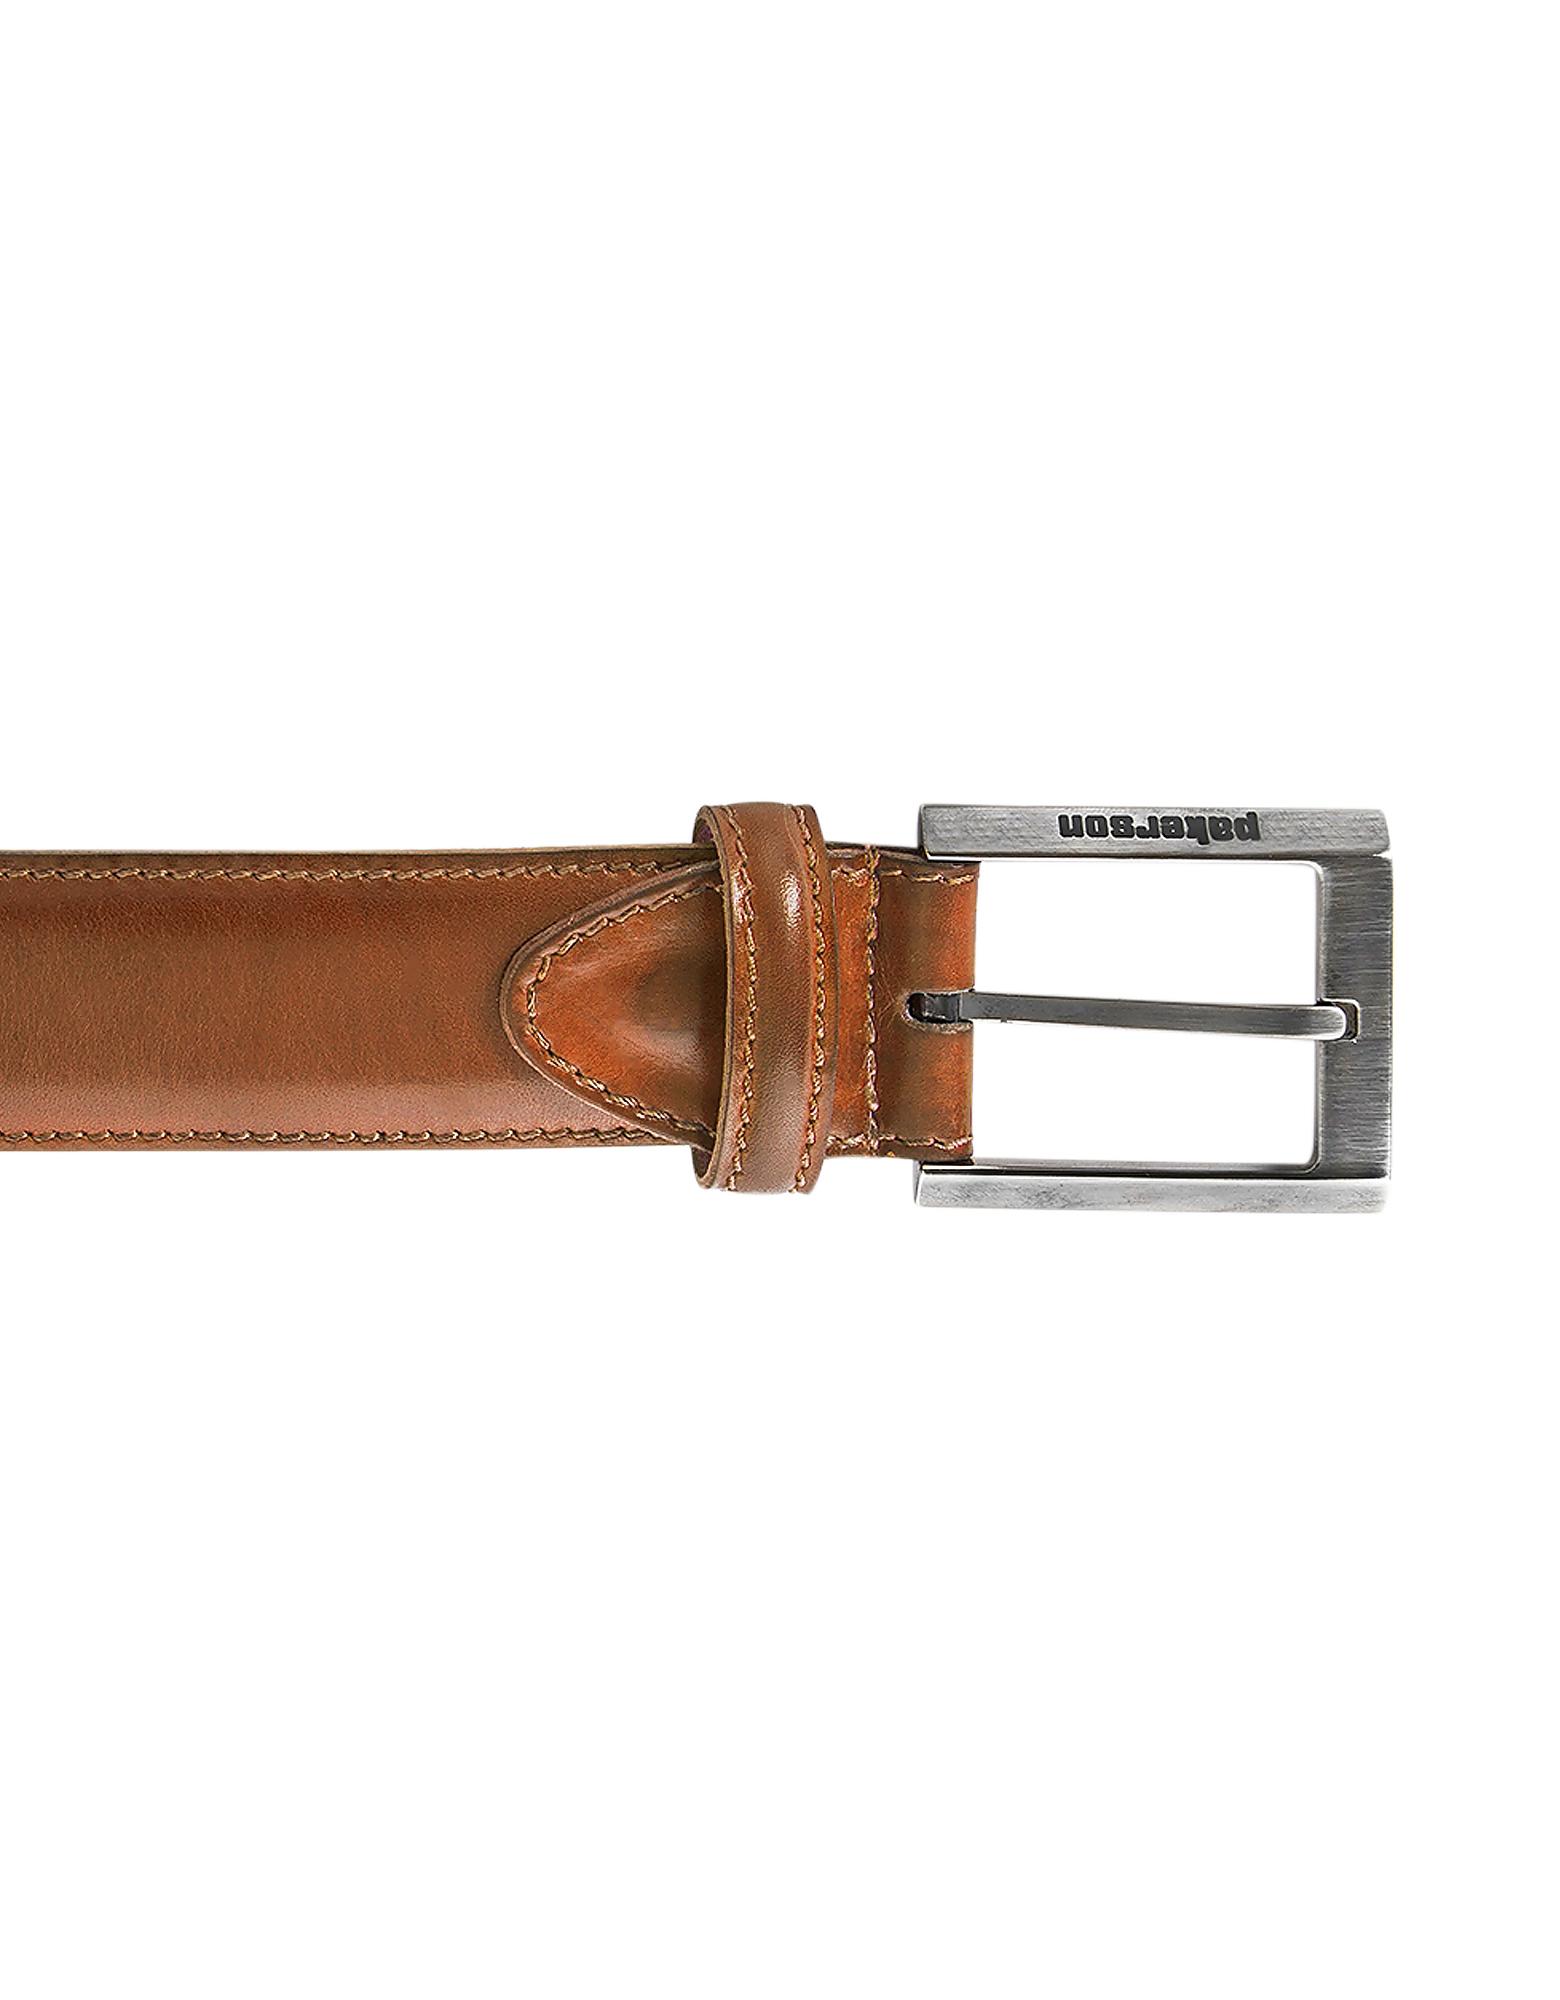 Pakerson Designer Men's Belts, Volterra Tan Handmade Italian Leather Belt